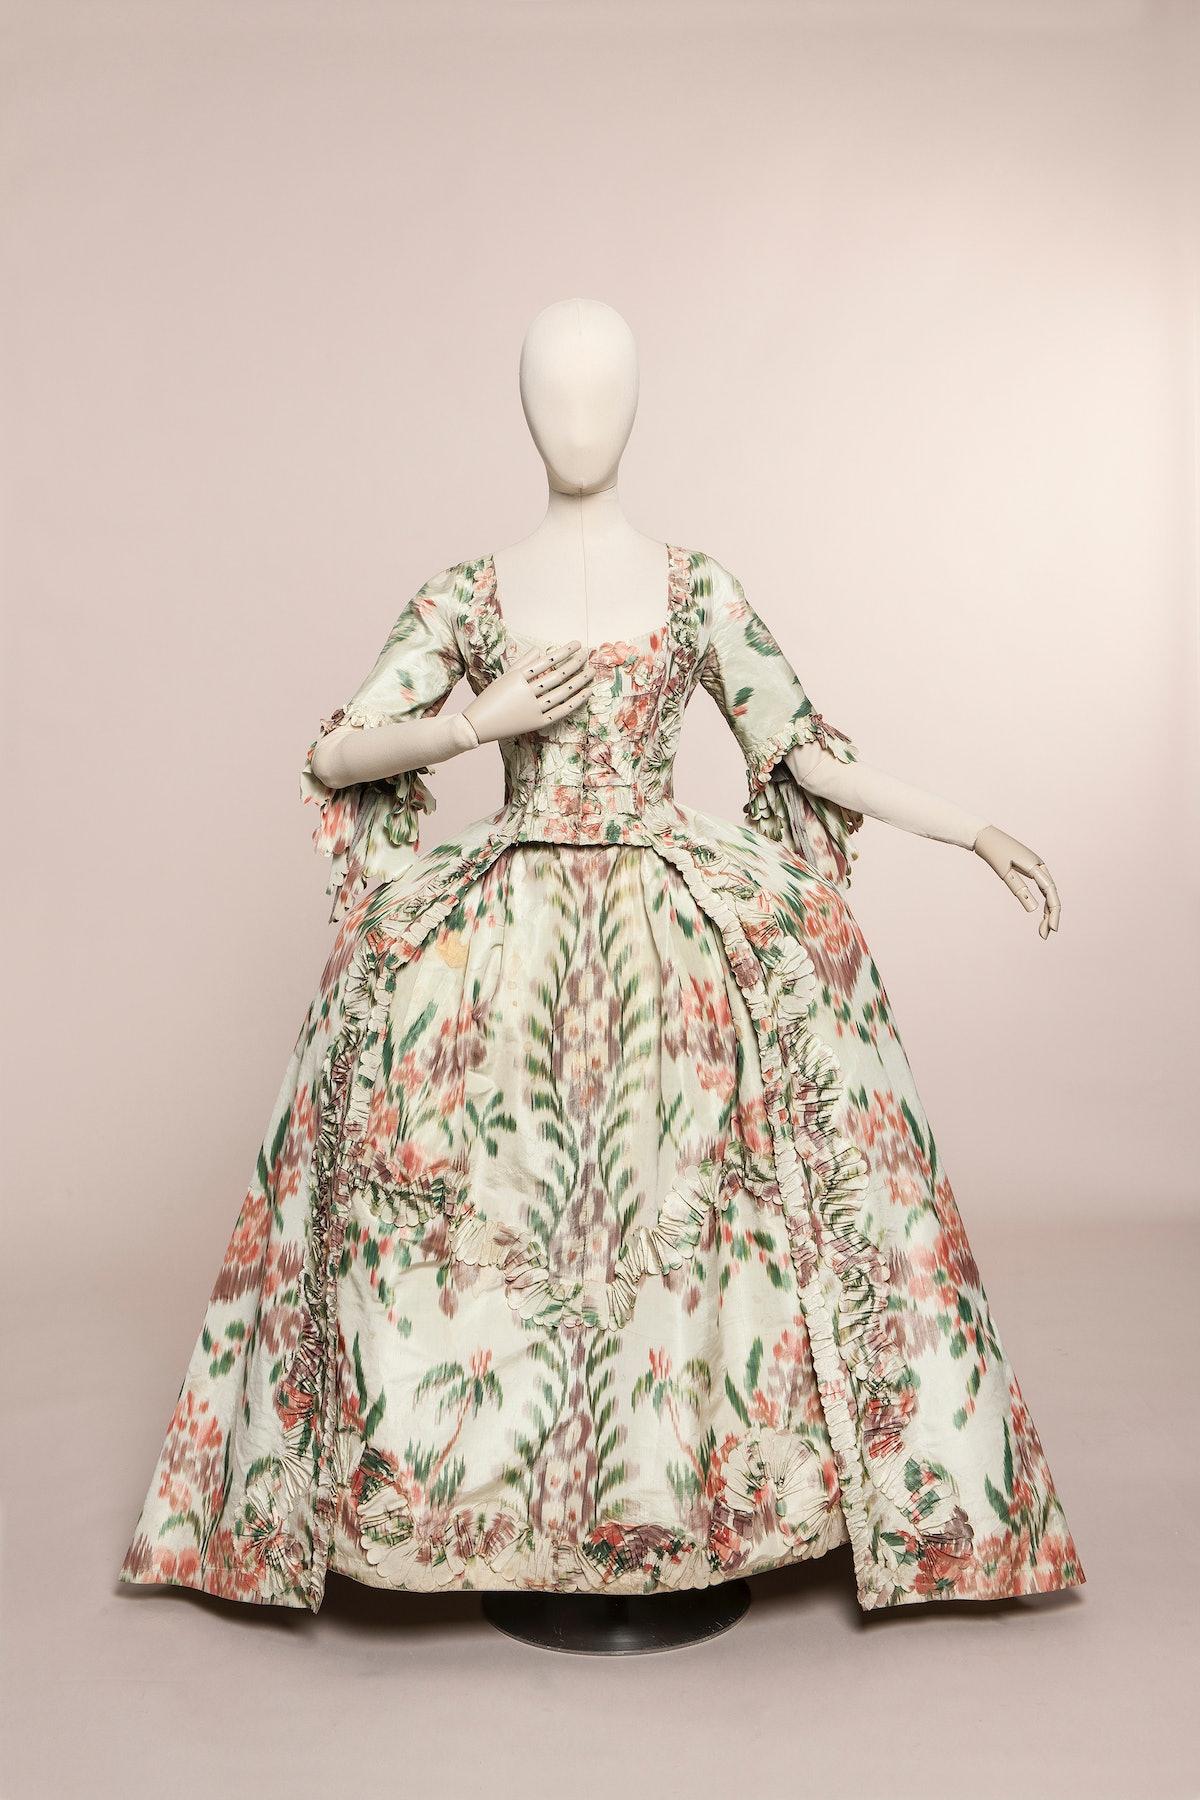 Fashion Forward: Three Centuries of Fashion